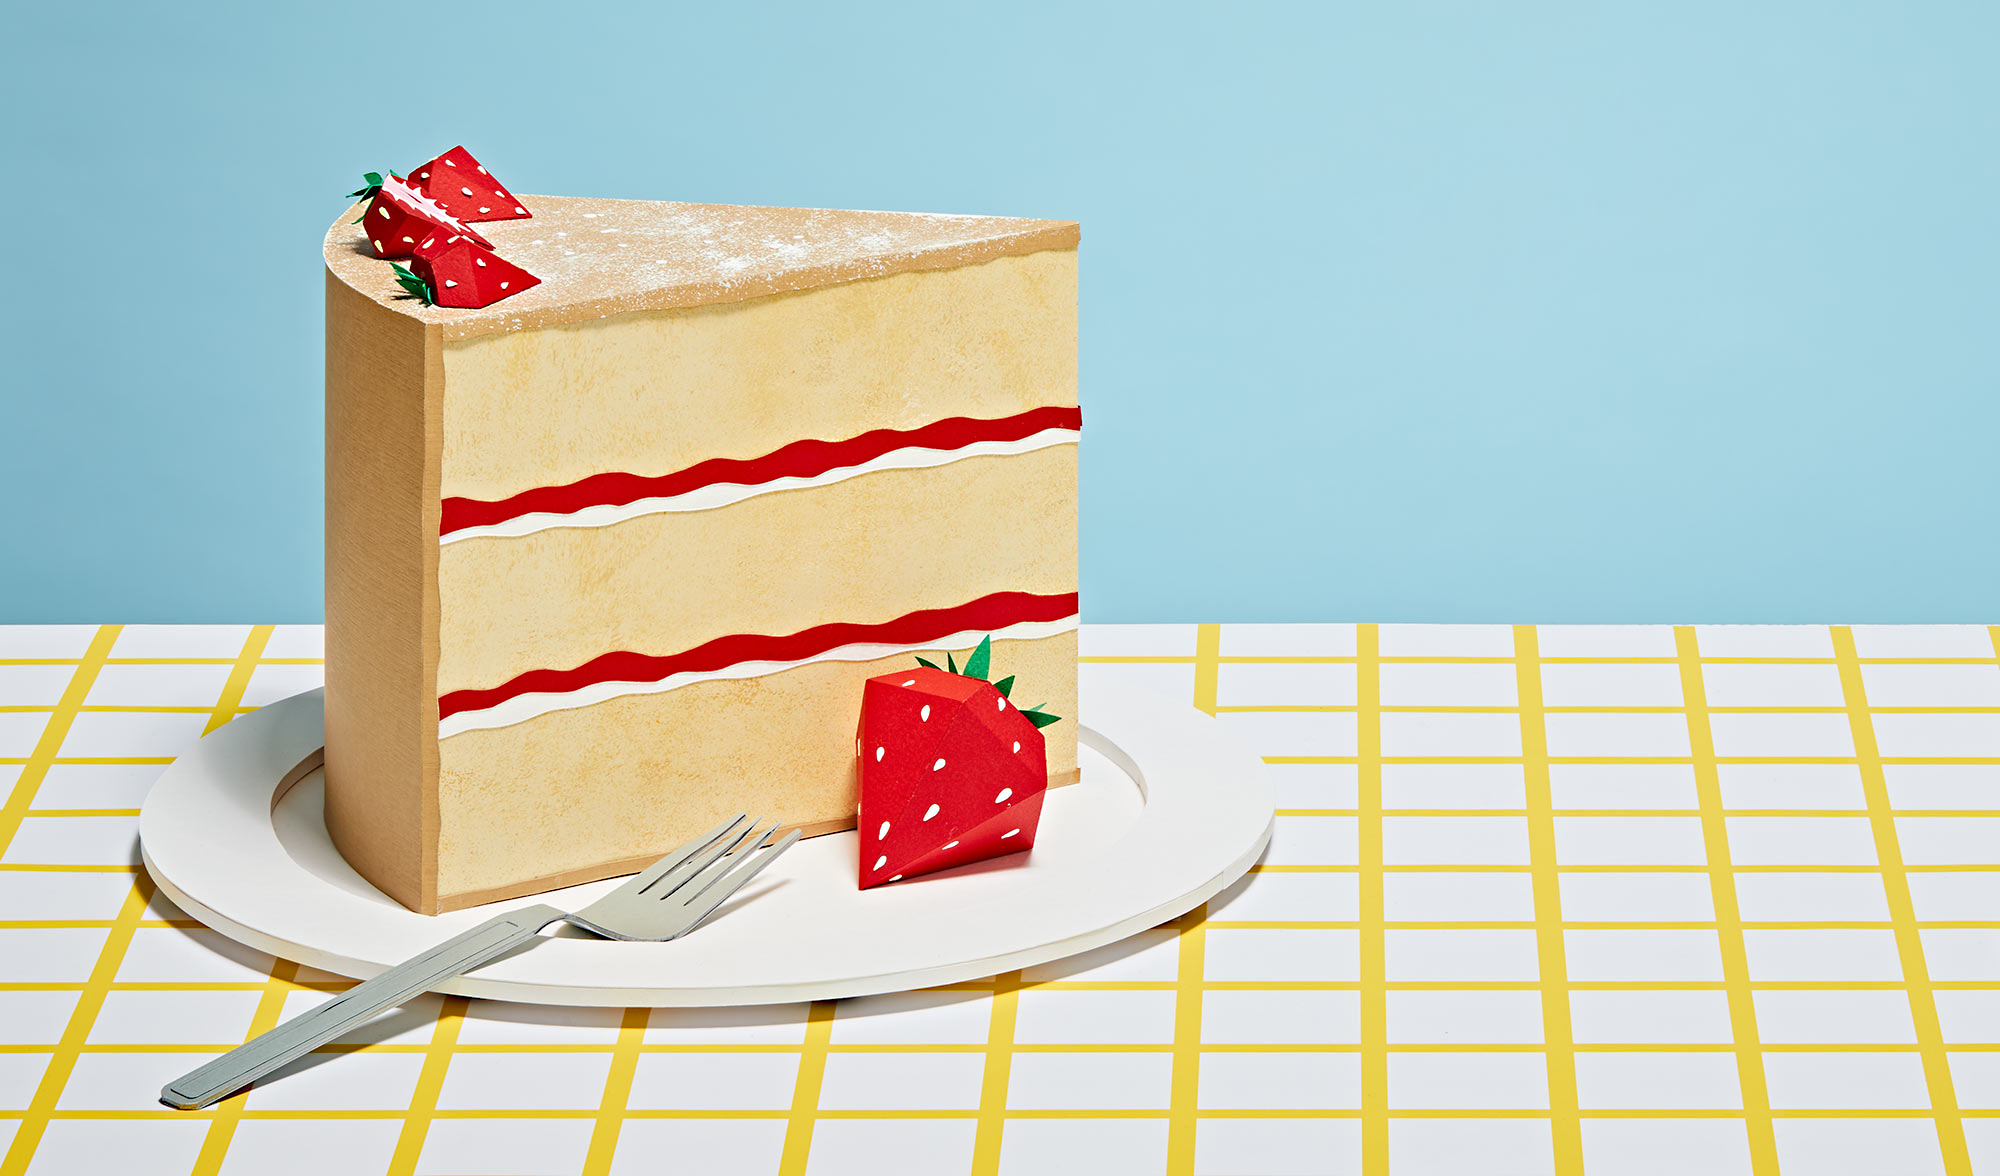 hatti newman food paper artist cake